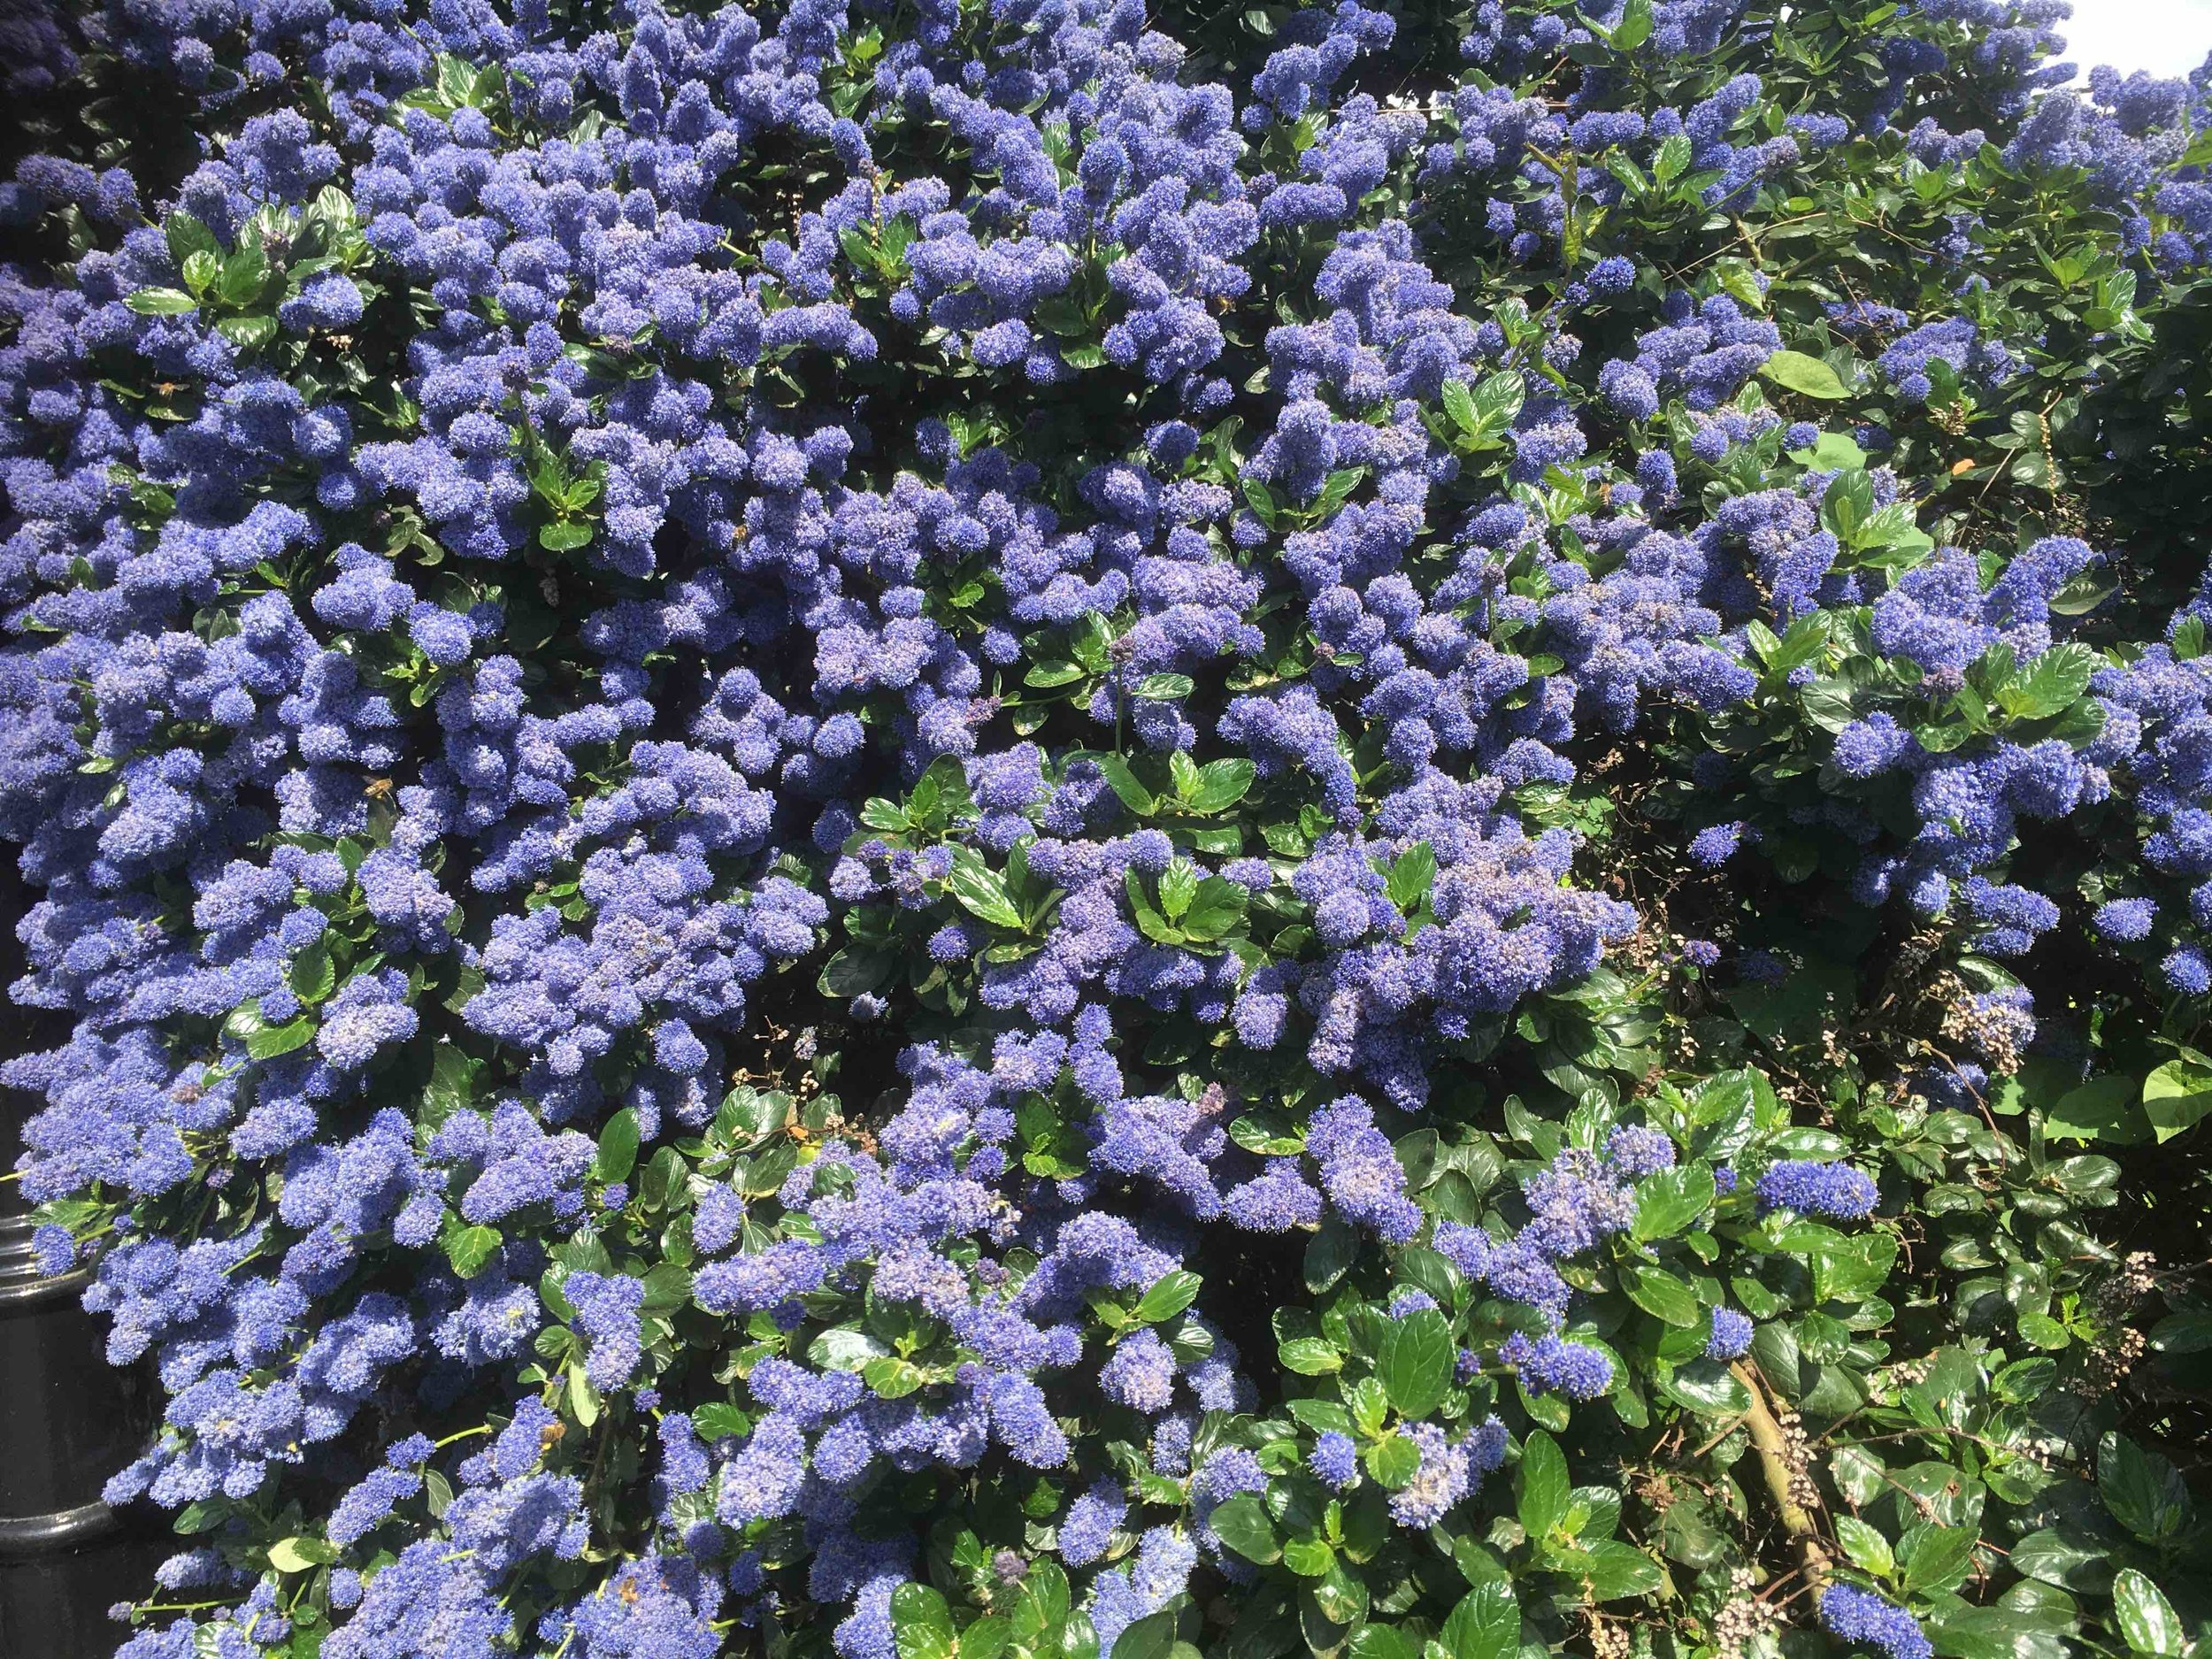 ceanothus_flower.jpg